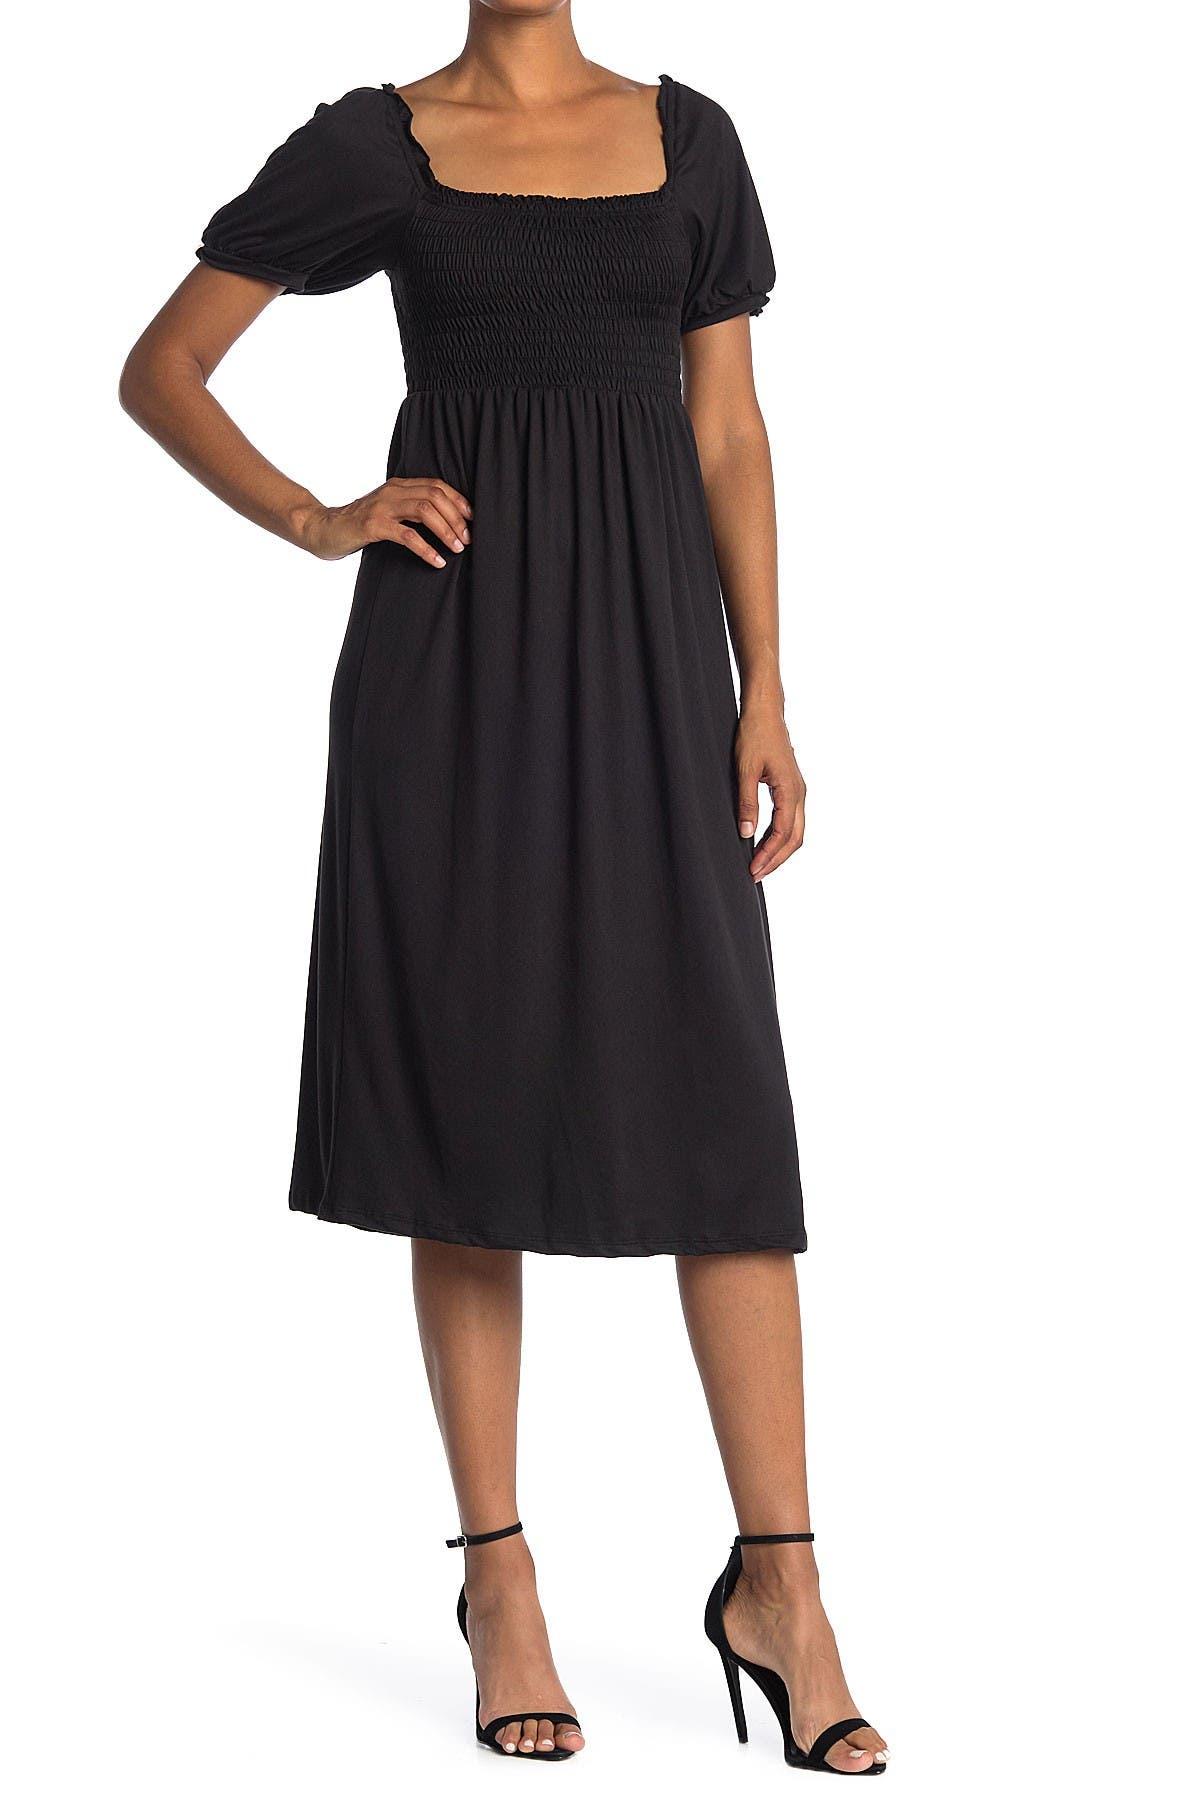 Image of Velvet Torch Smocked Puff Sleeve Midi Dress